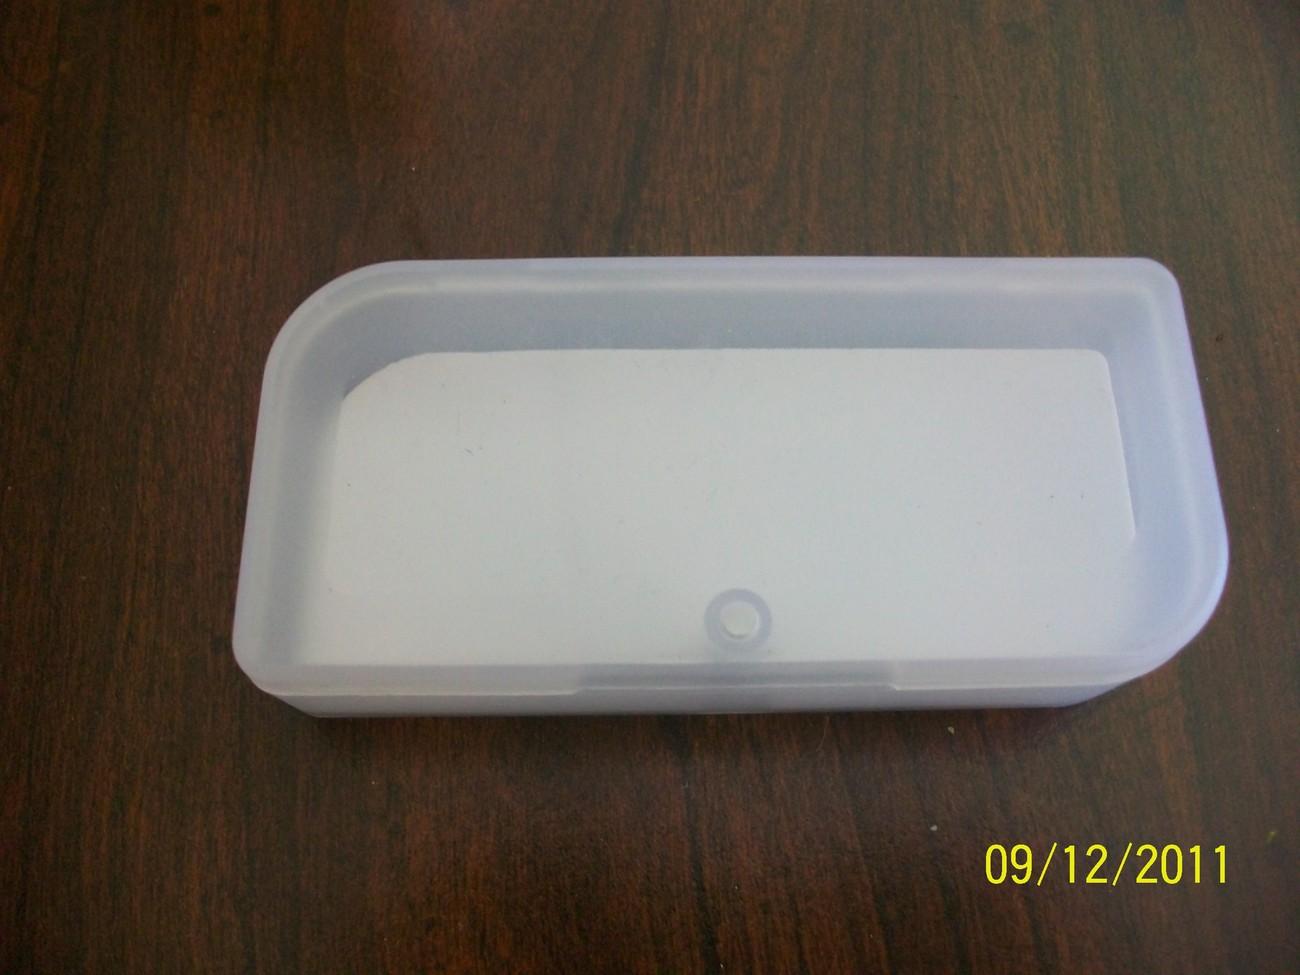 Brand new Clear plastic USB storage box holder